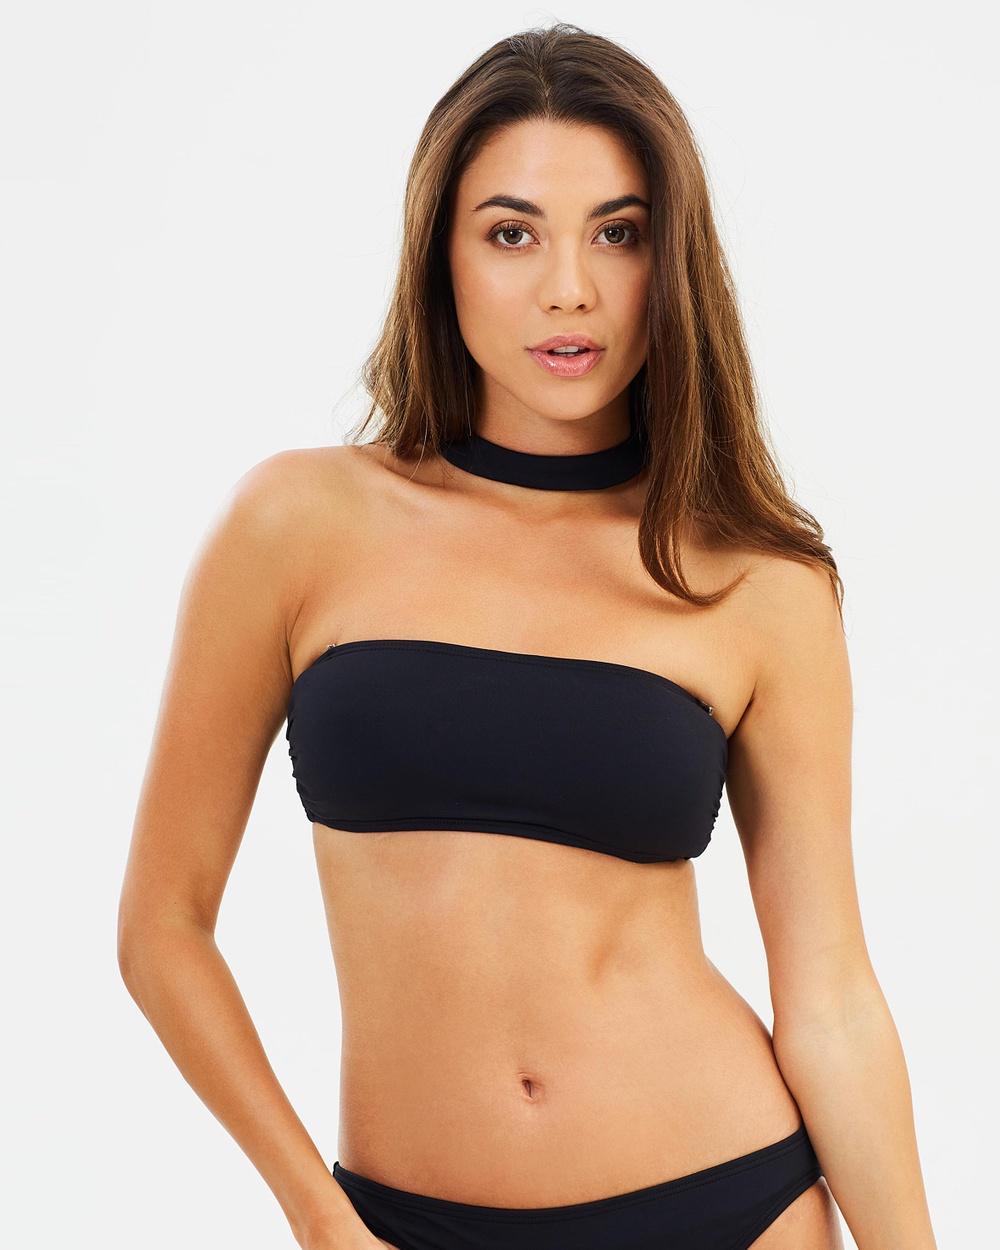 Michael Kors Choker Bandeau Bikini Top Bikini Tops Black Choker Bandeau Bikini Top